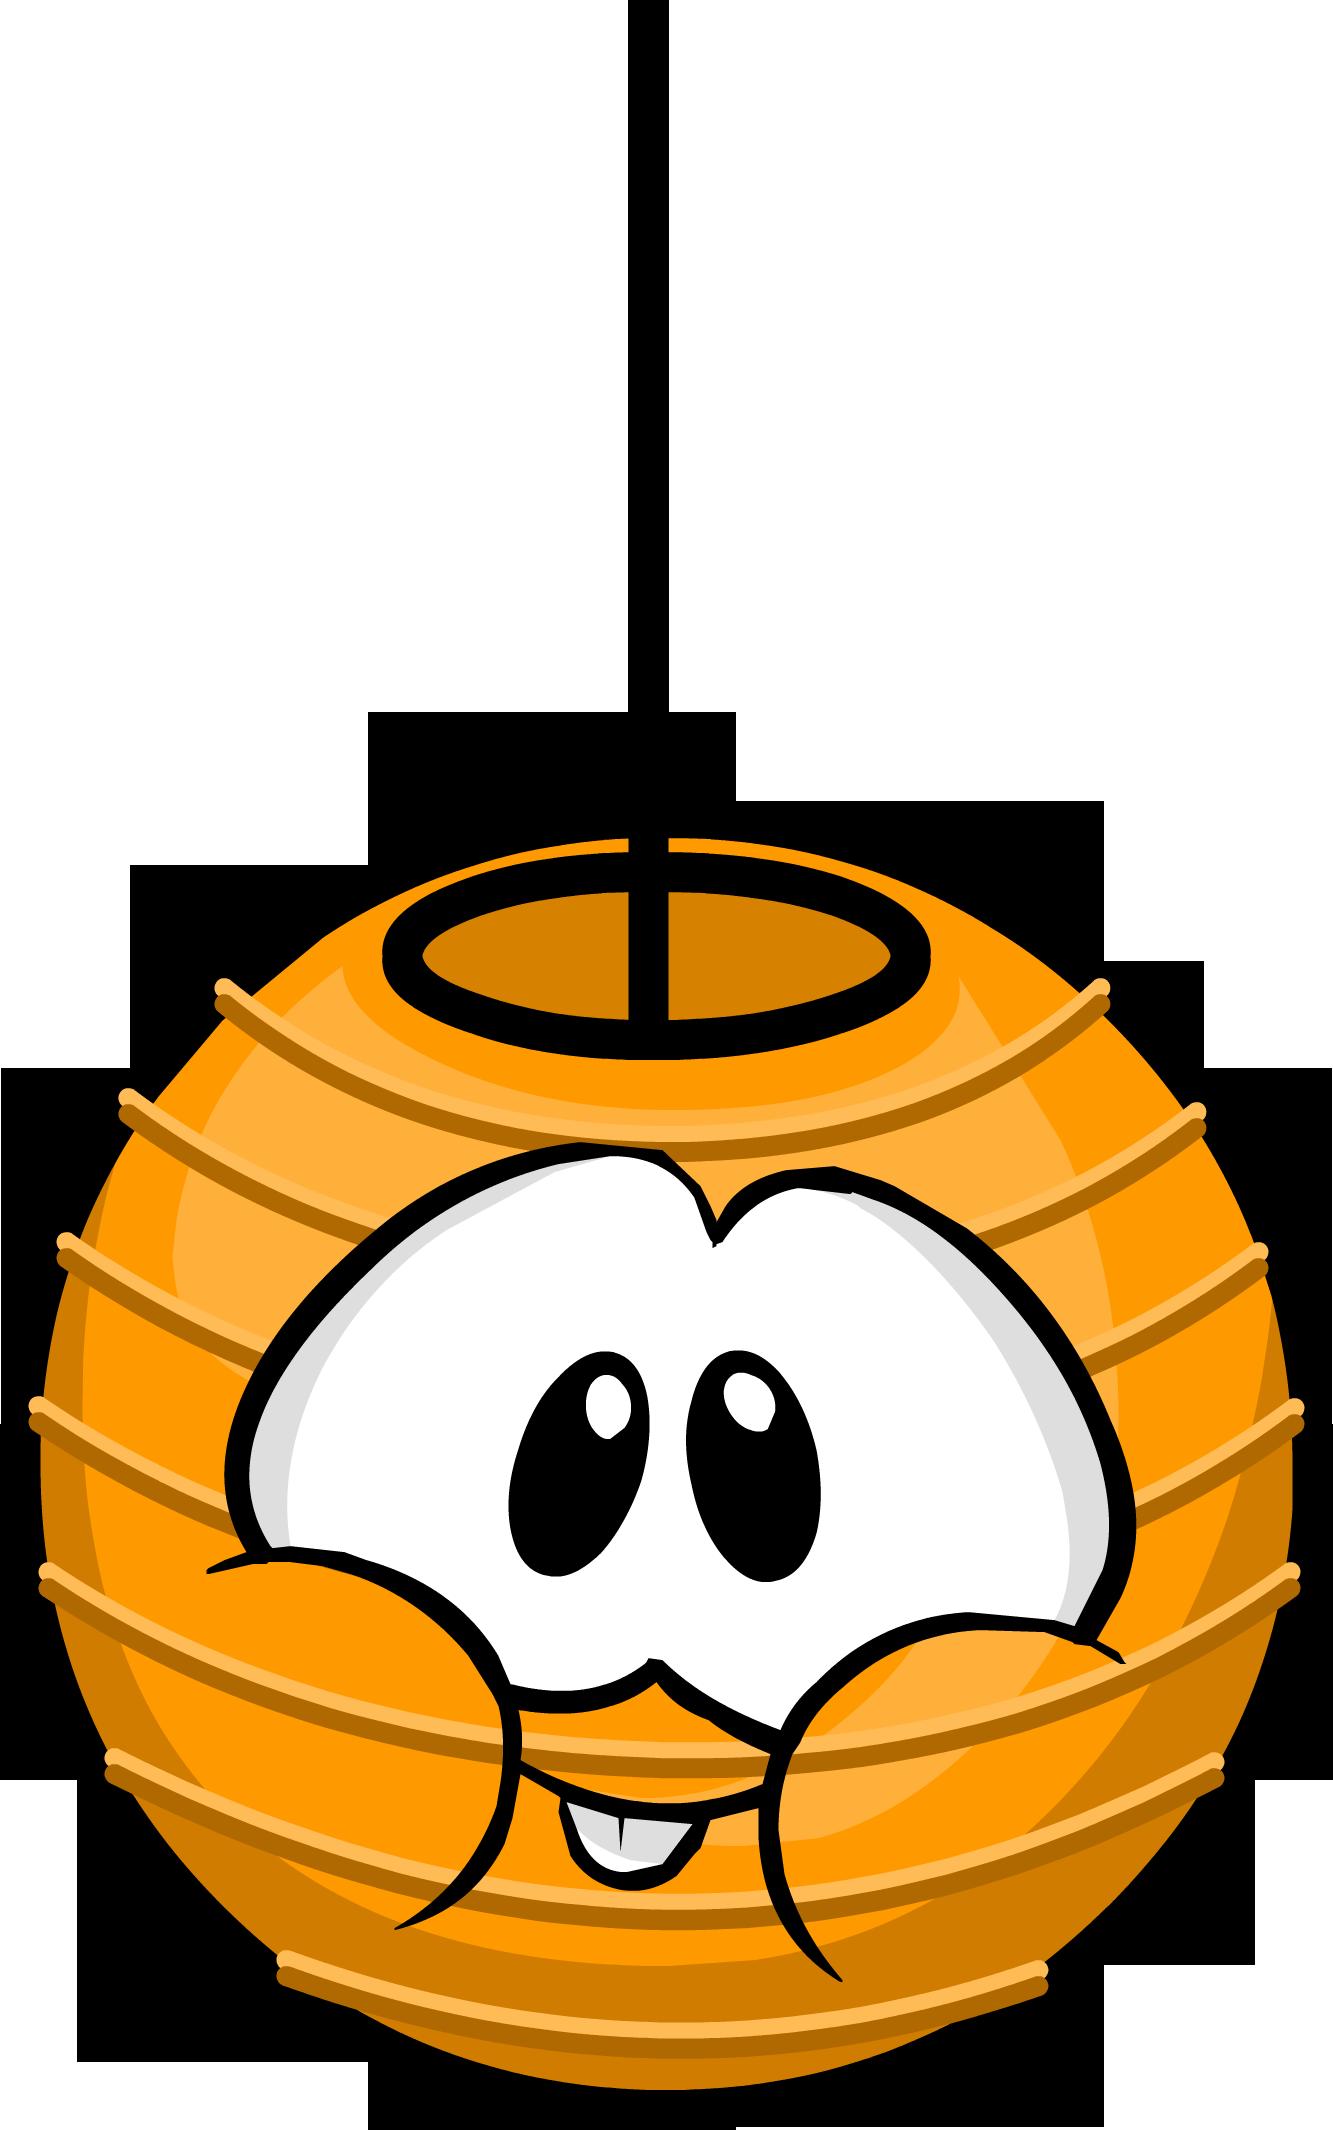 Cheeky Lantern